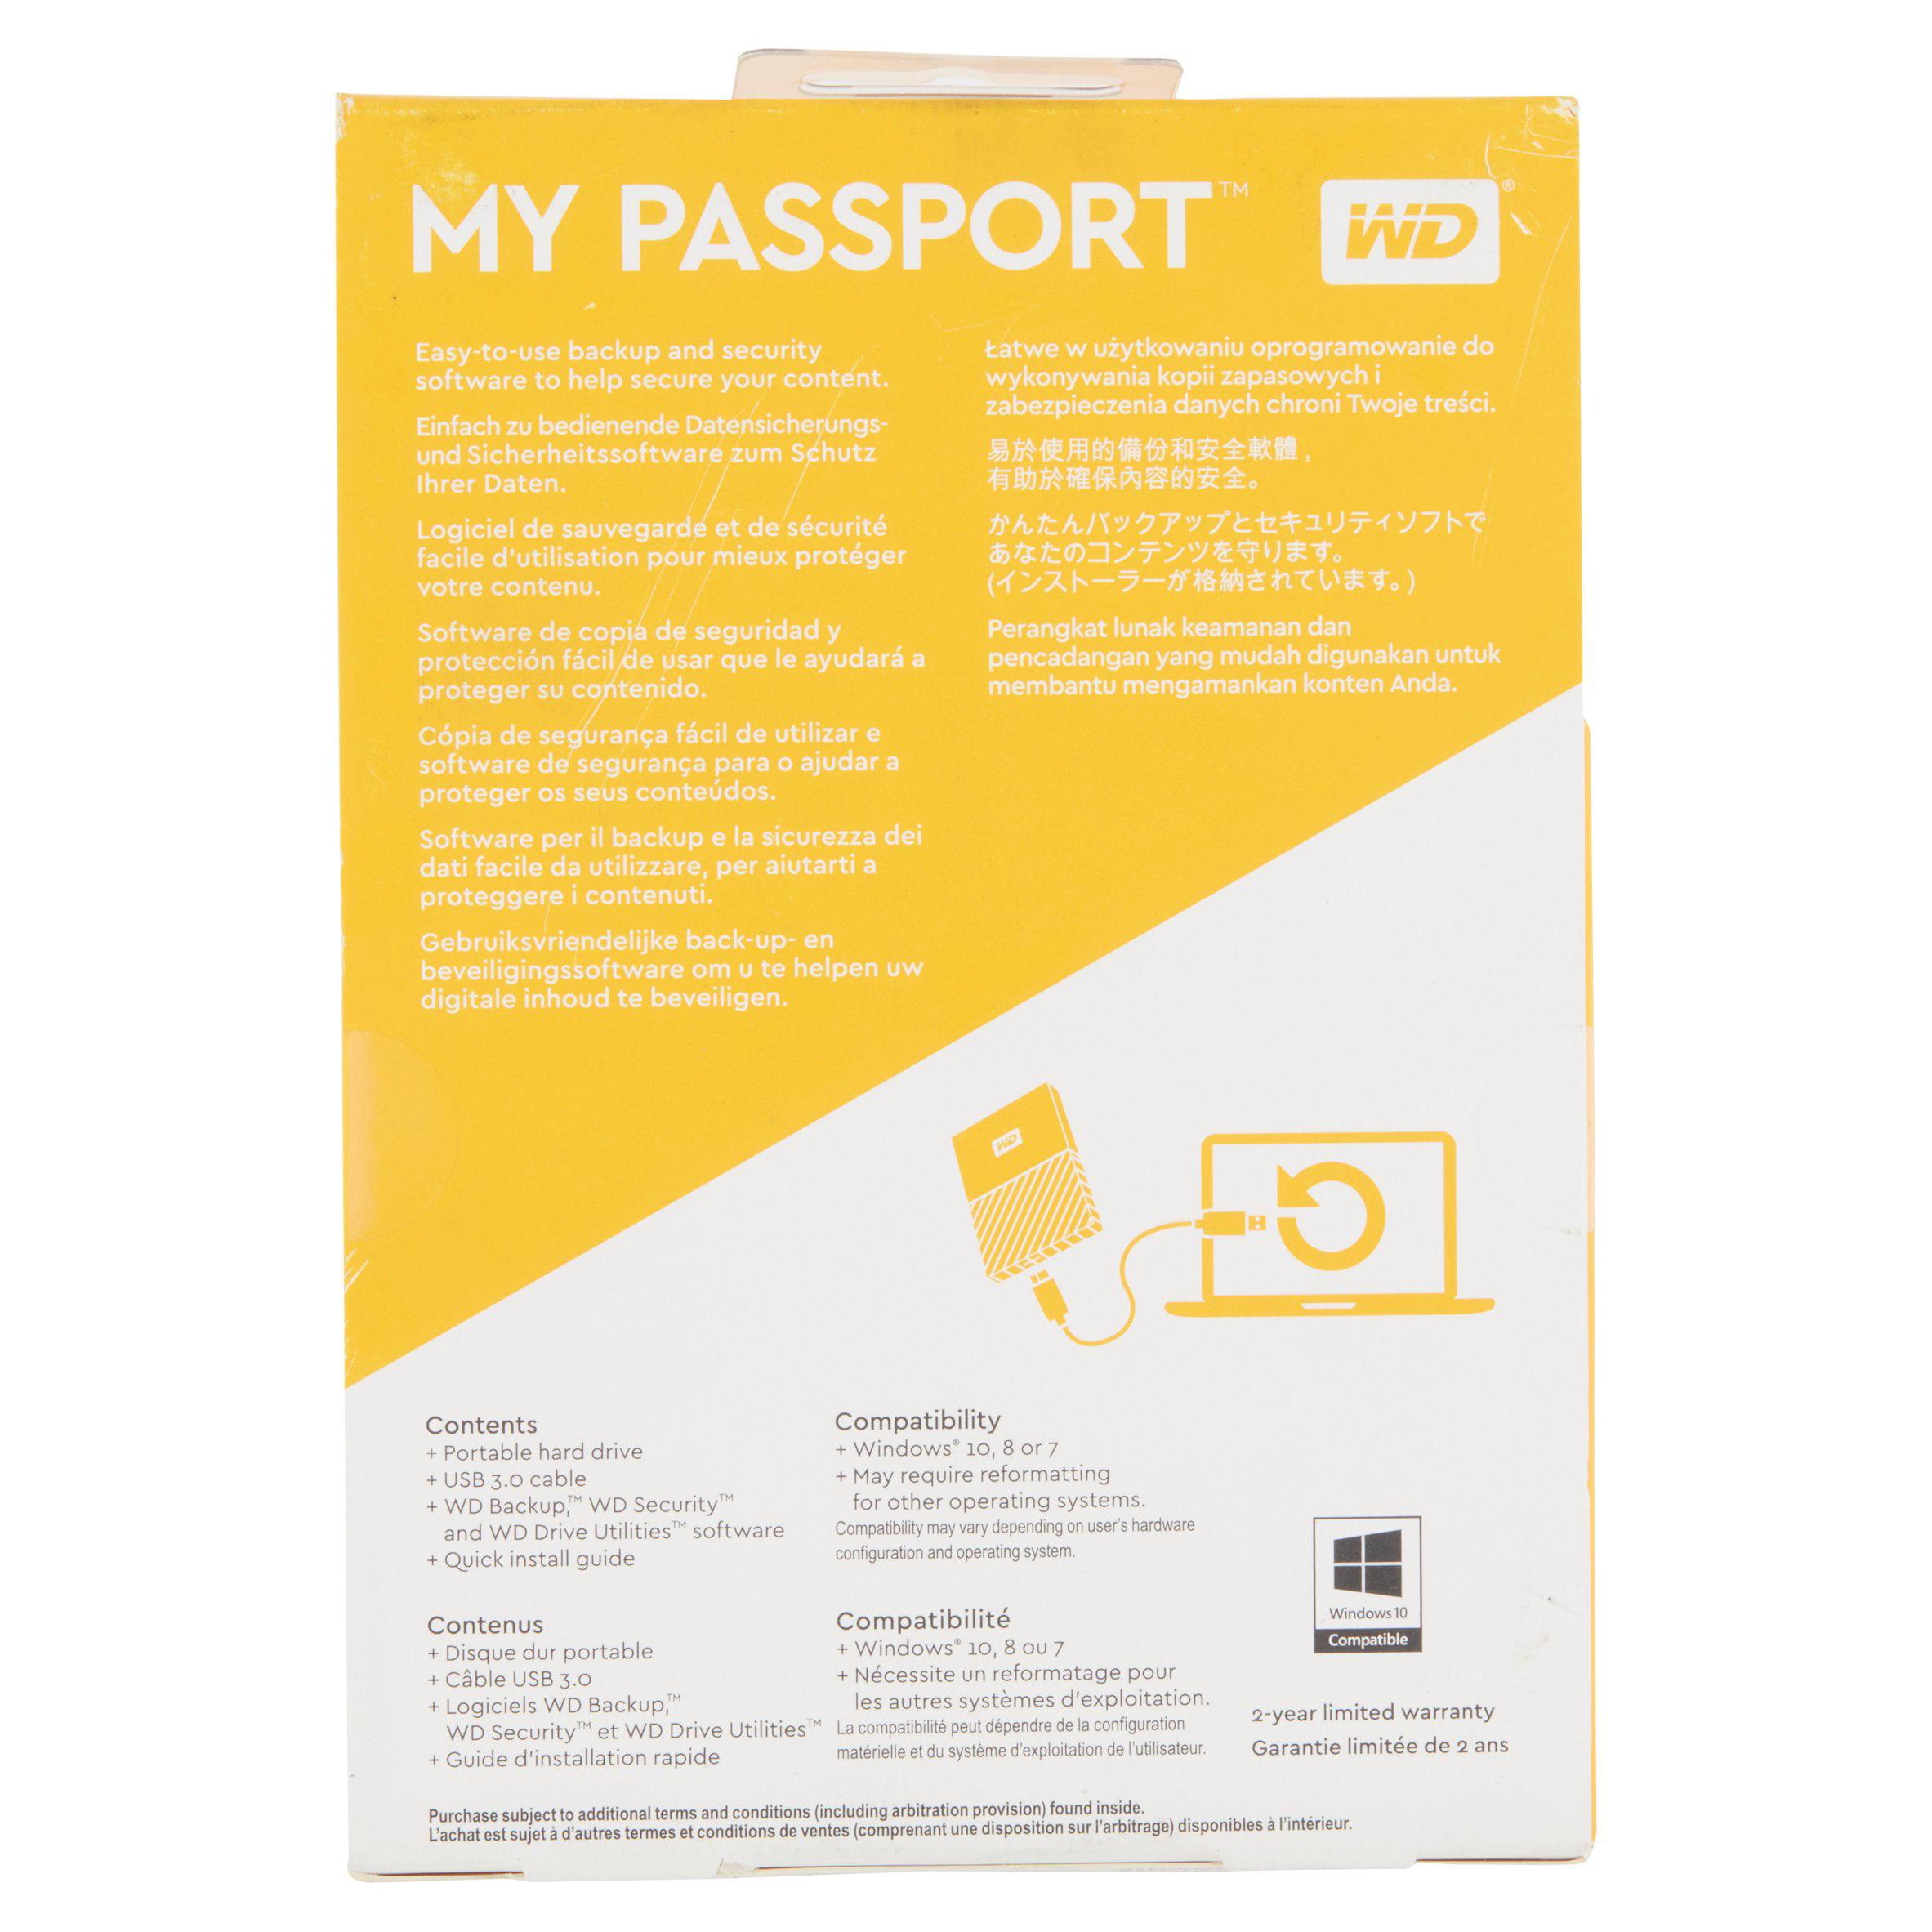 How To Get A Passport Photo At Walmart By Ahmet Vefik Pasa